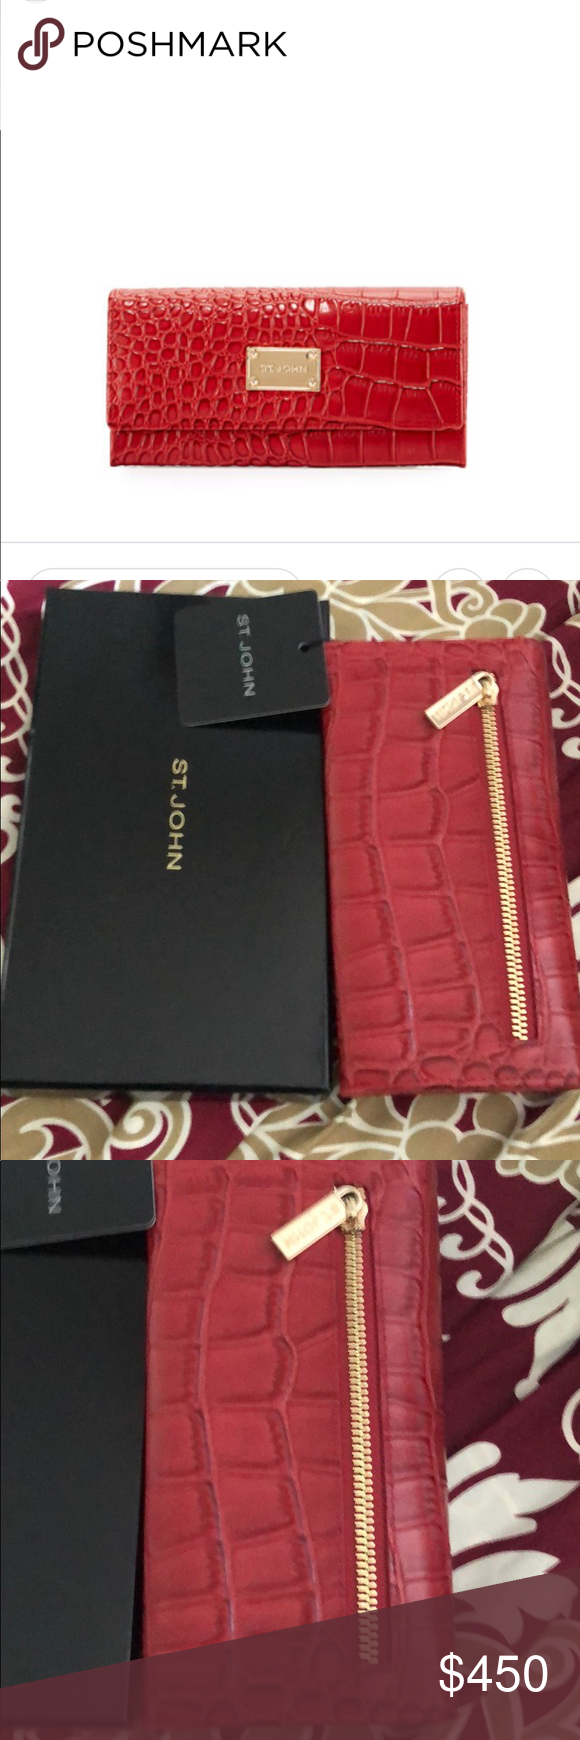 St John Crocodile Embossed Leather Wallet Red Leather Wallet Embossed Leather Wallet